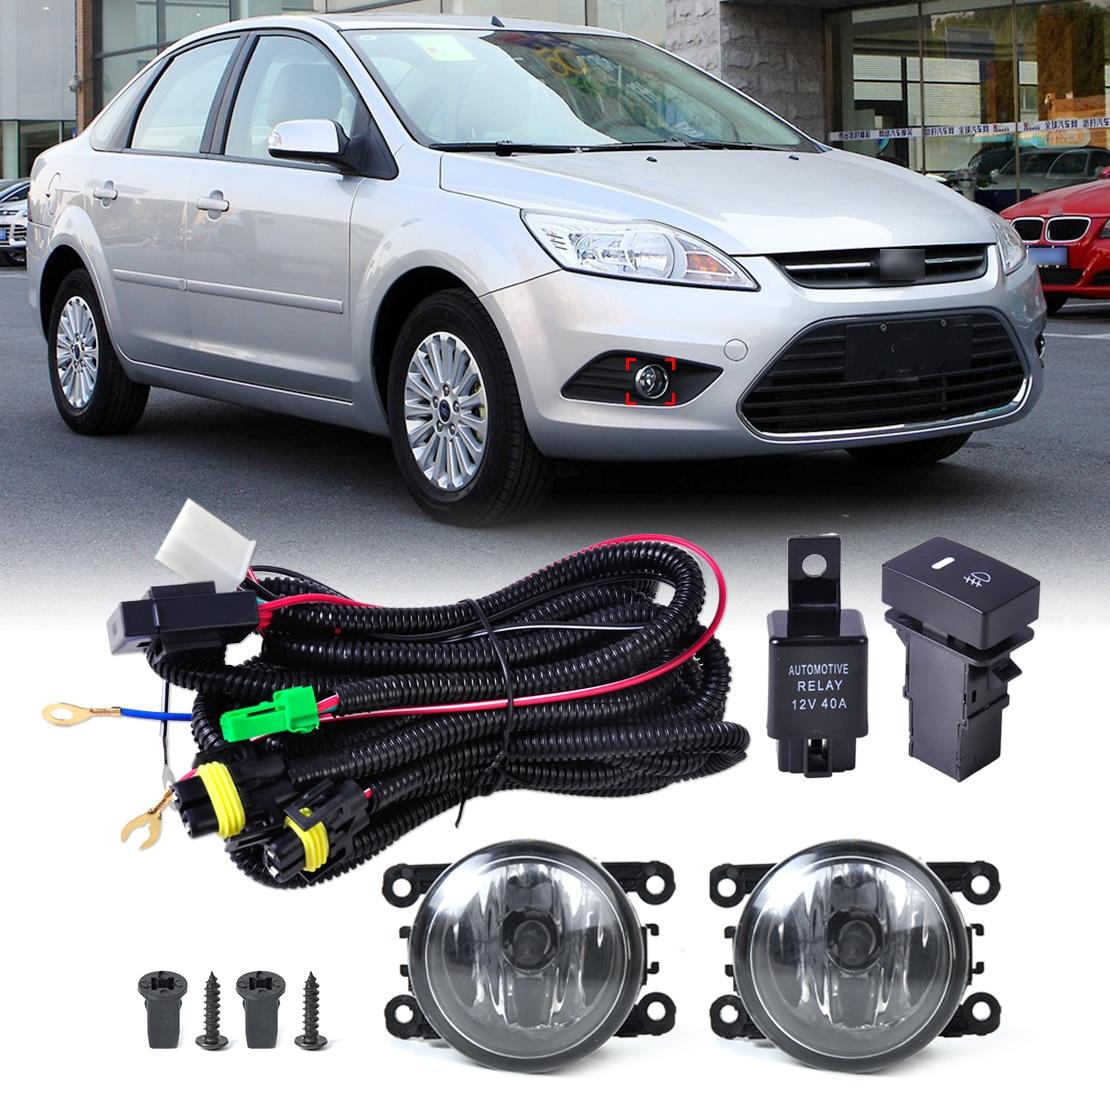 DWCX Wiring Harness Sockets Switch 2pcs Fog Lights Lamp 4F9Z 15200 AA for Ford Focus Honda